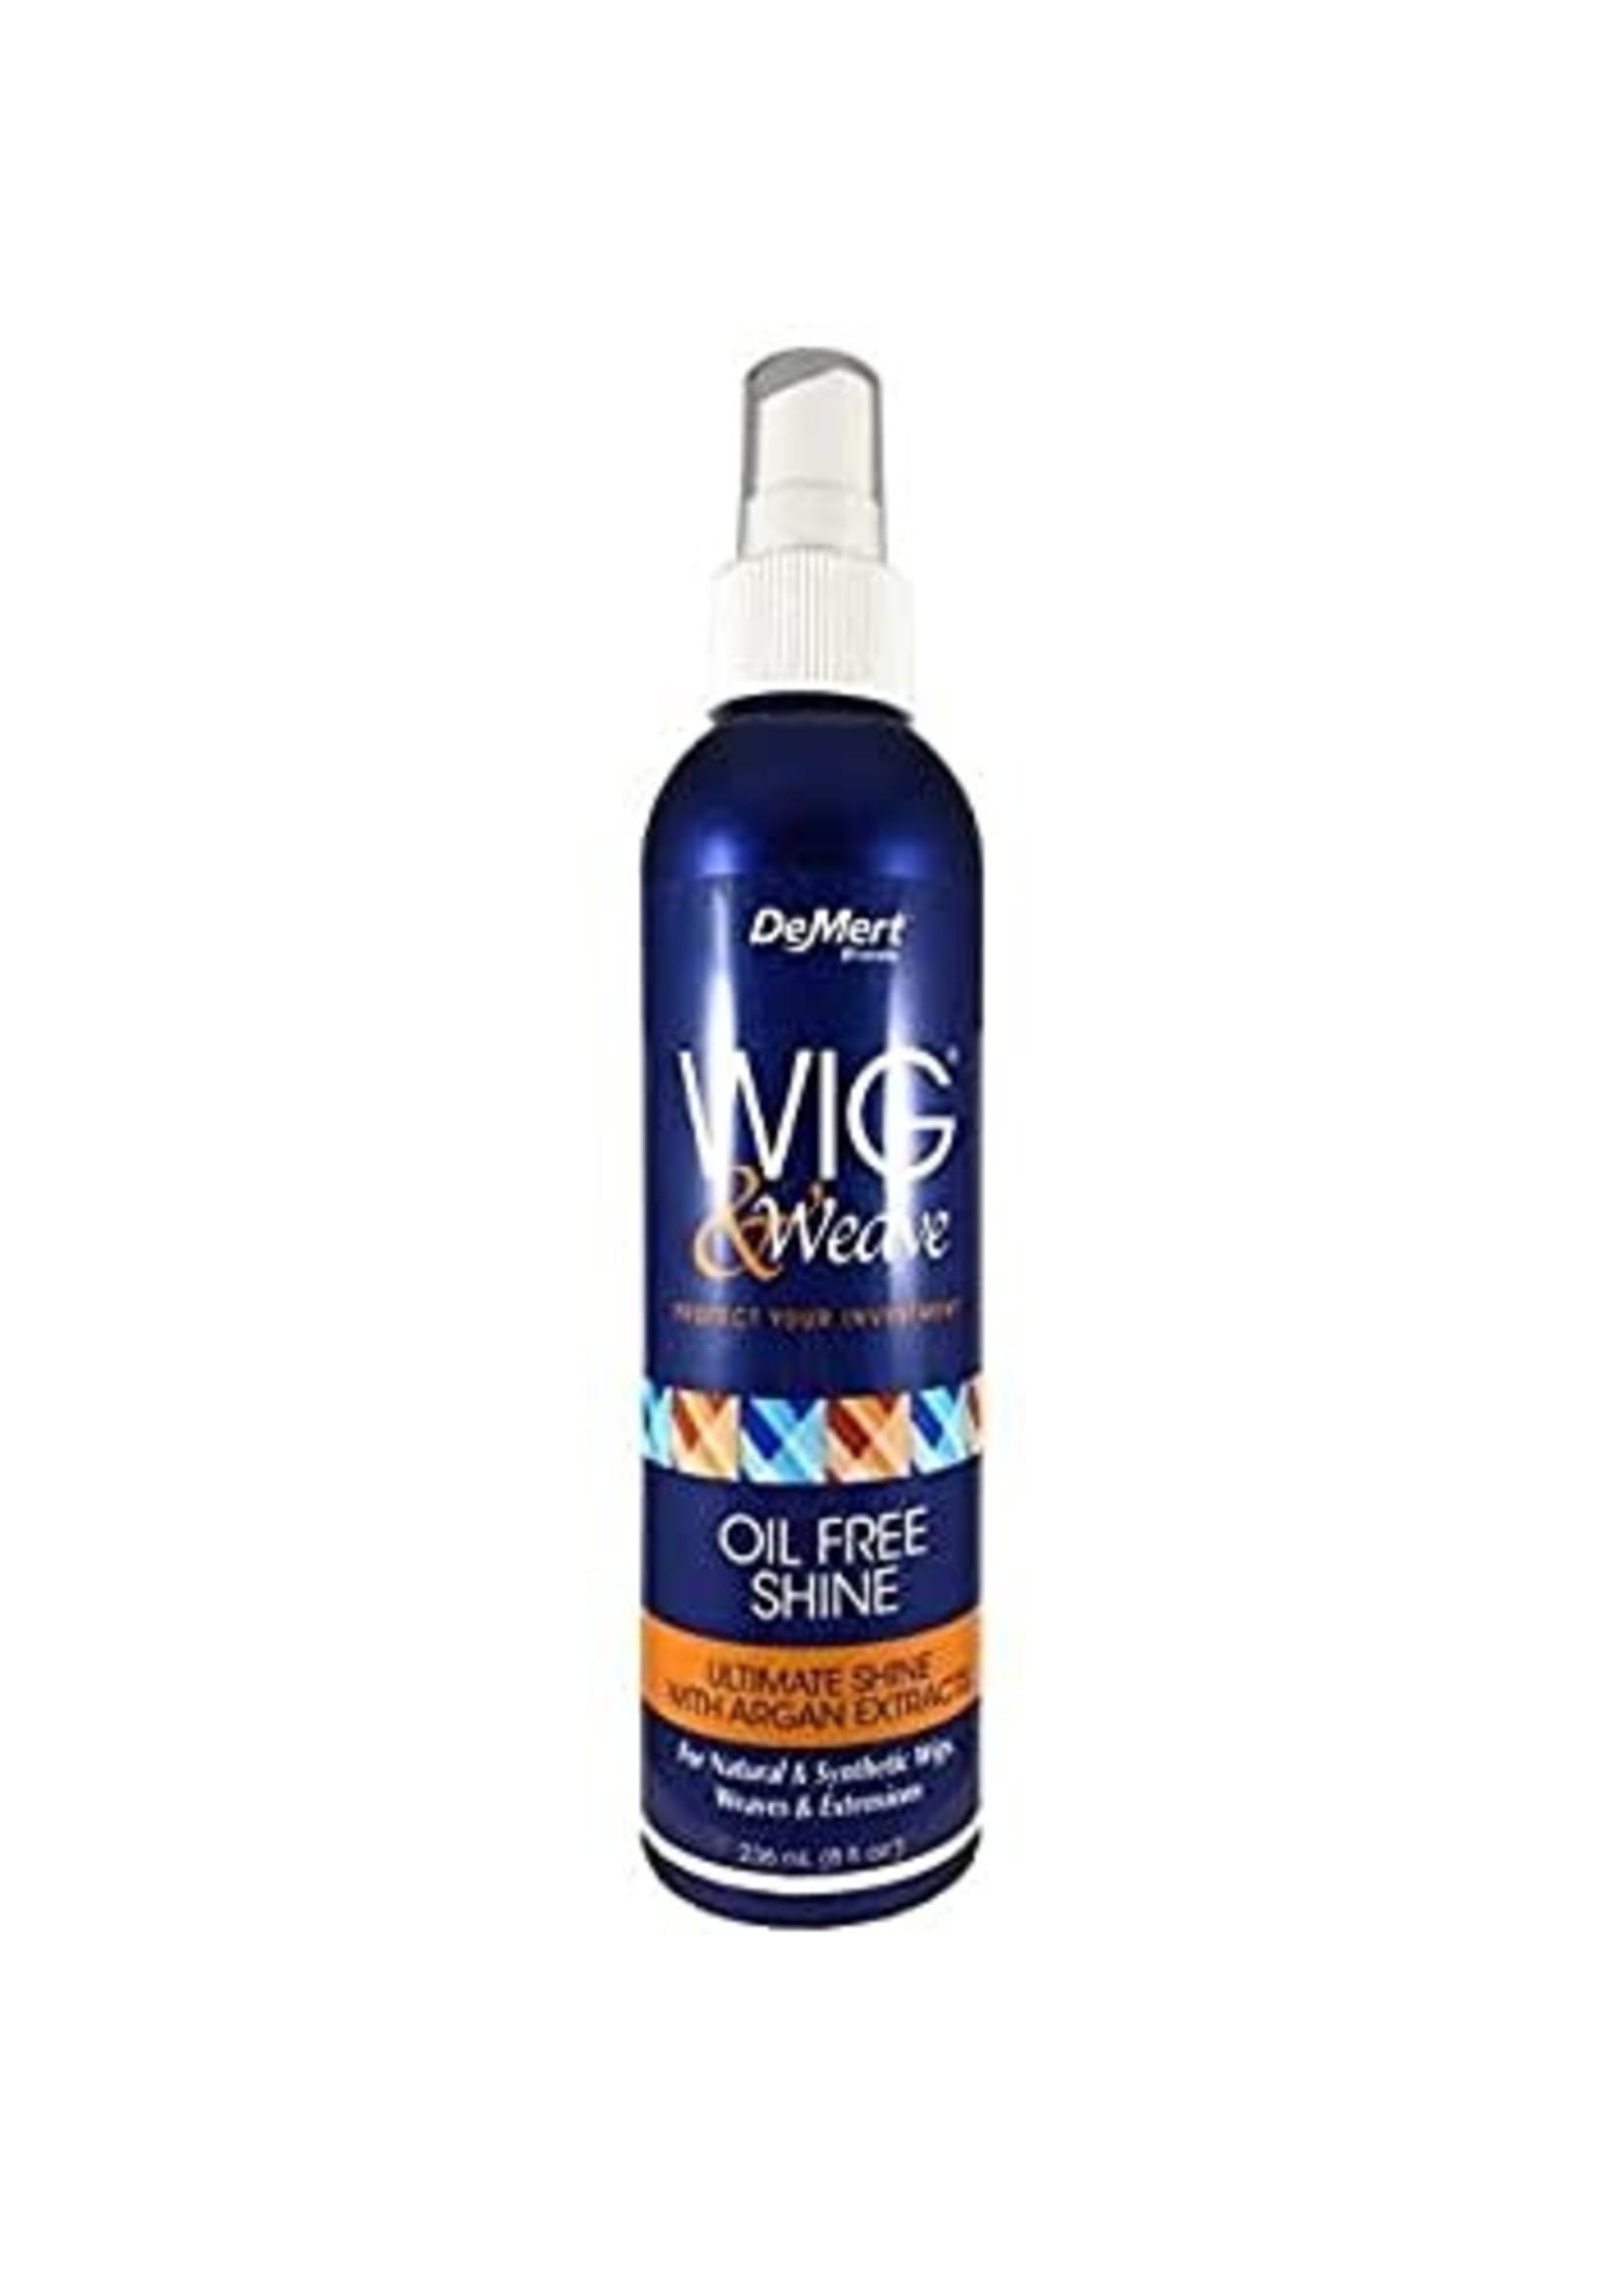 DeMert Wig & Weave Oil Free Shine Spray